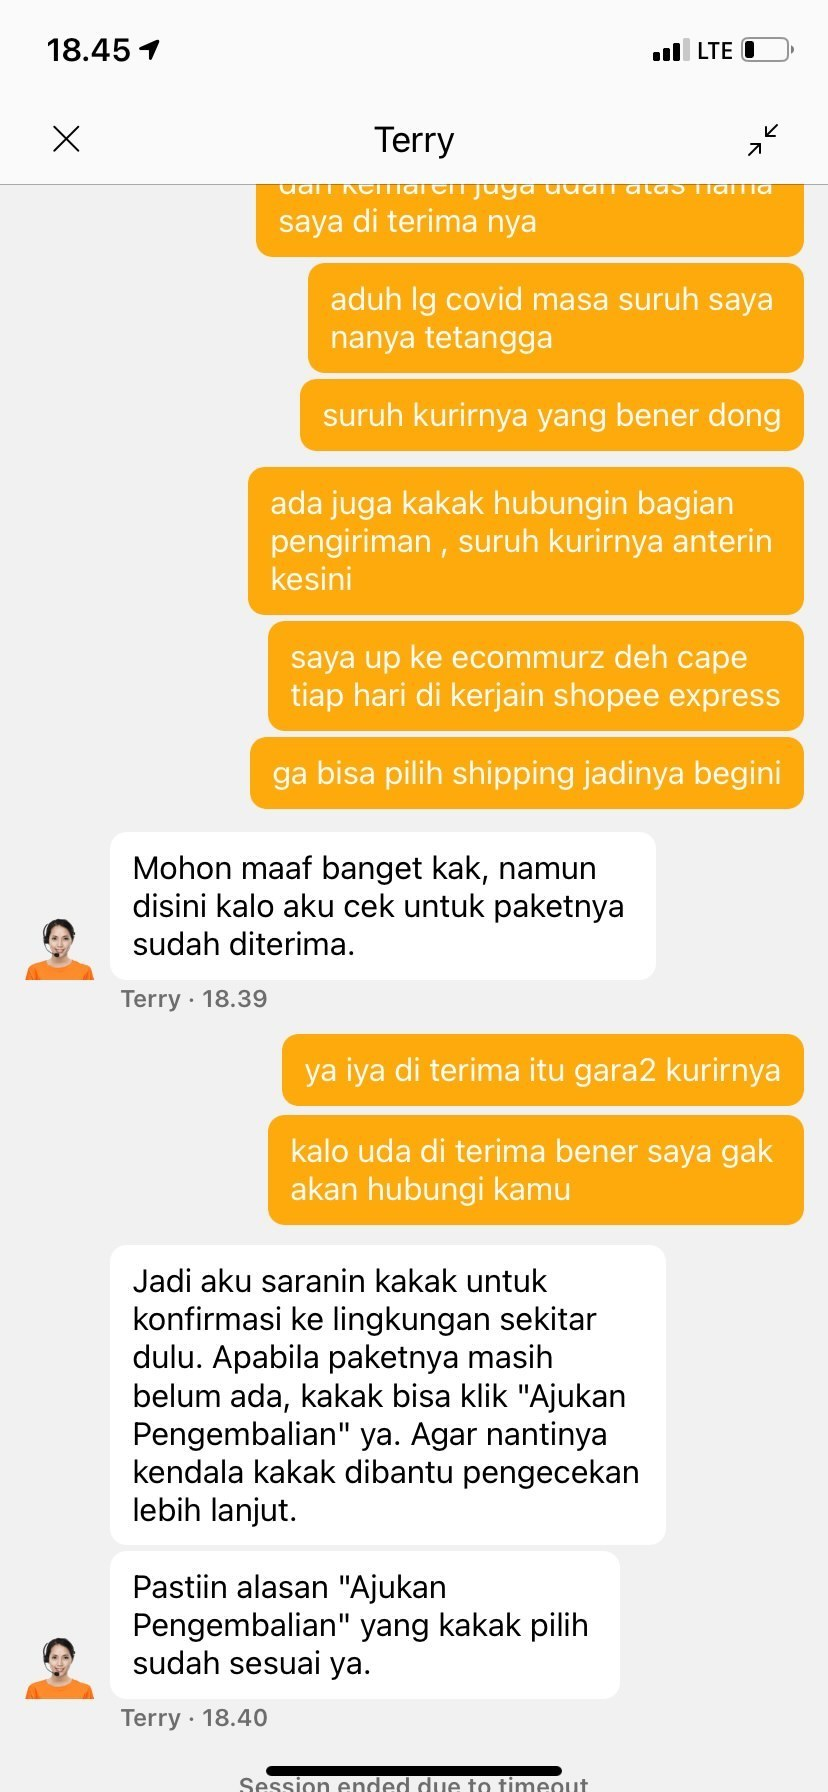 Jawaban CS Shopee yang tidakada solusi